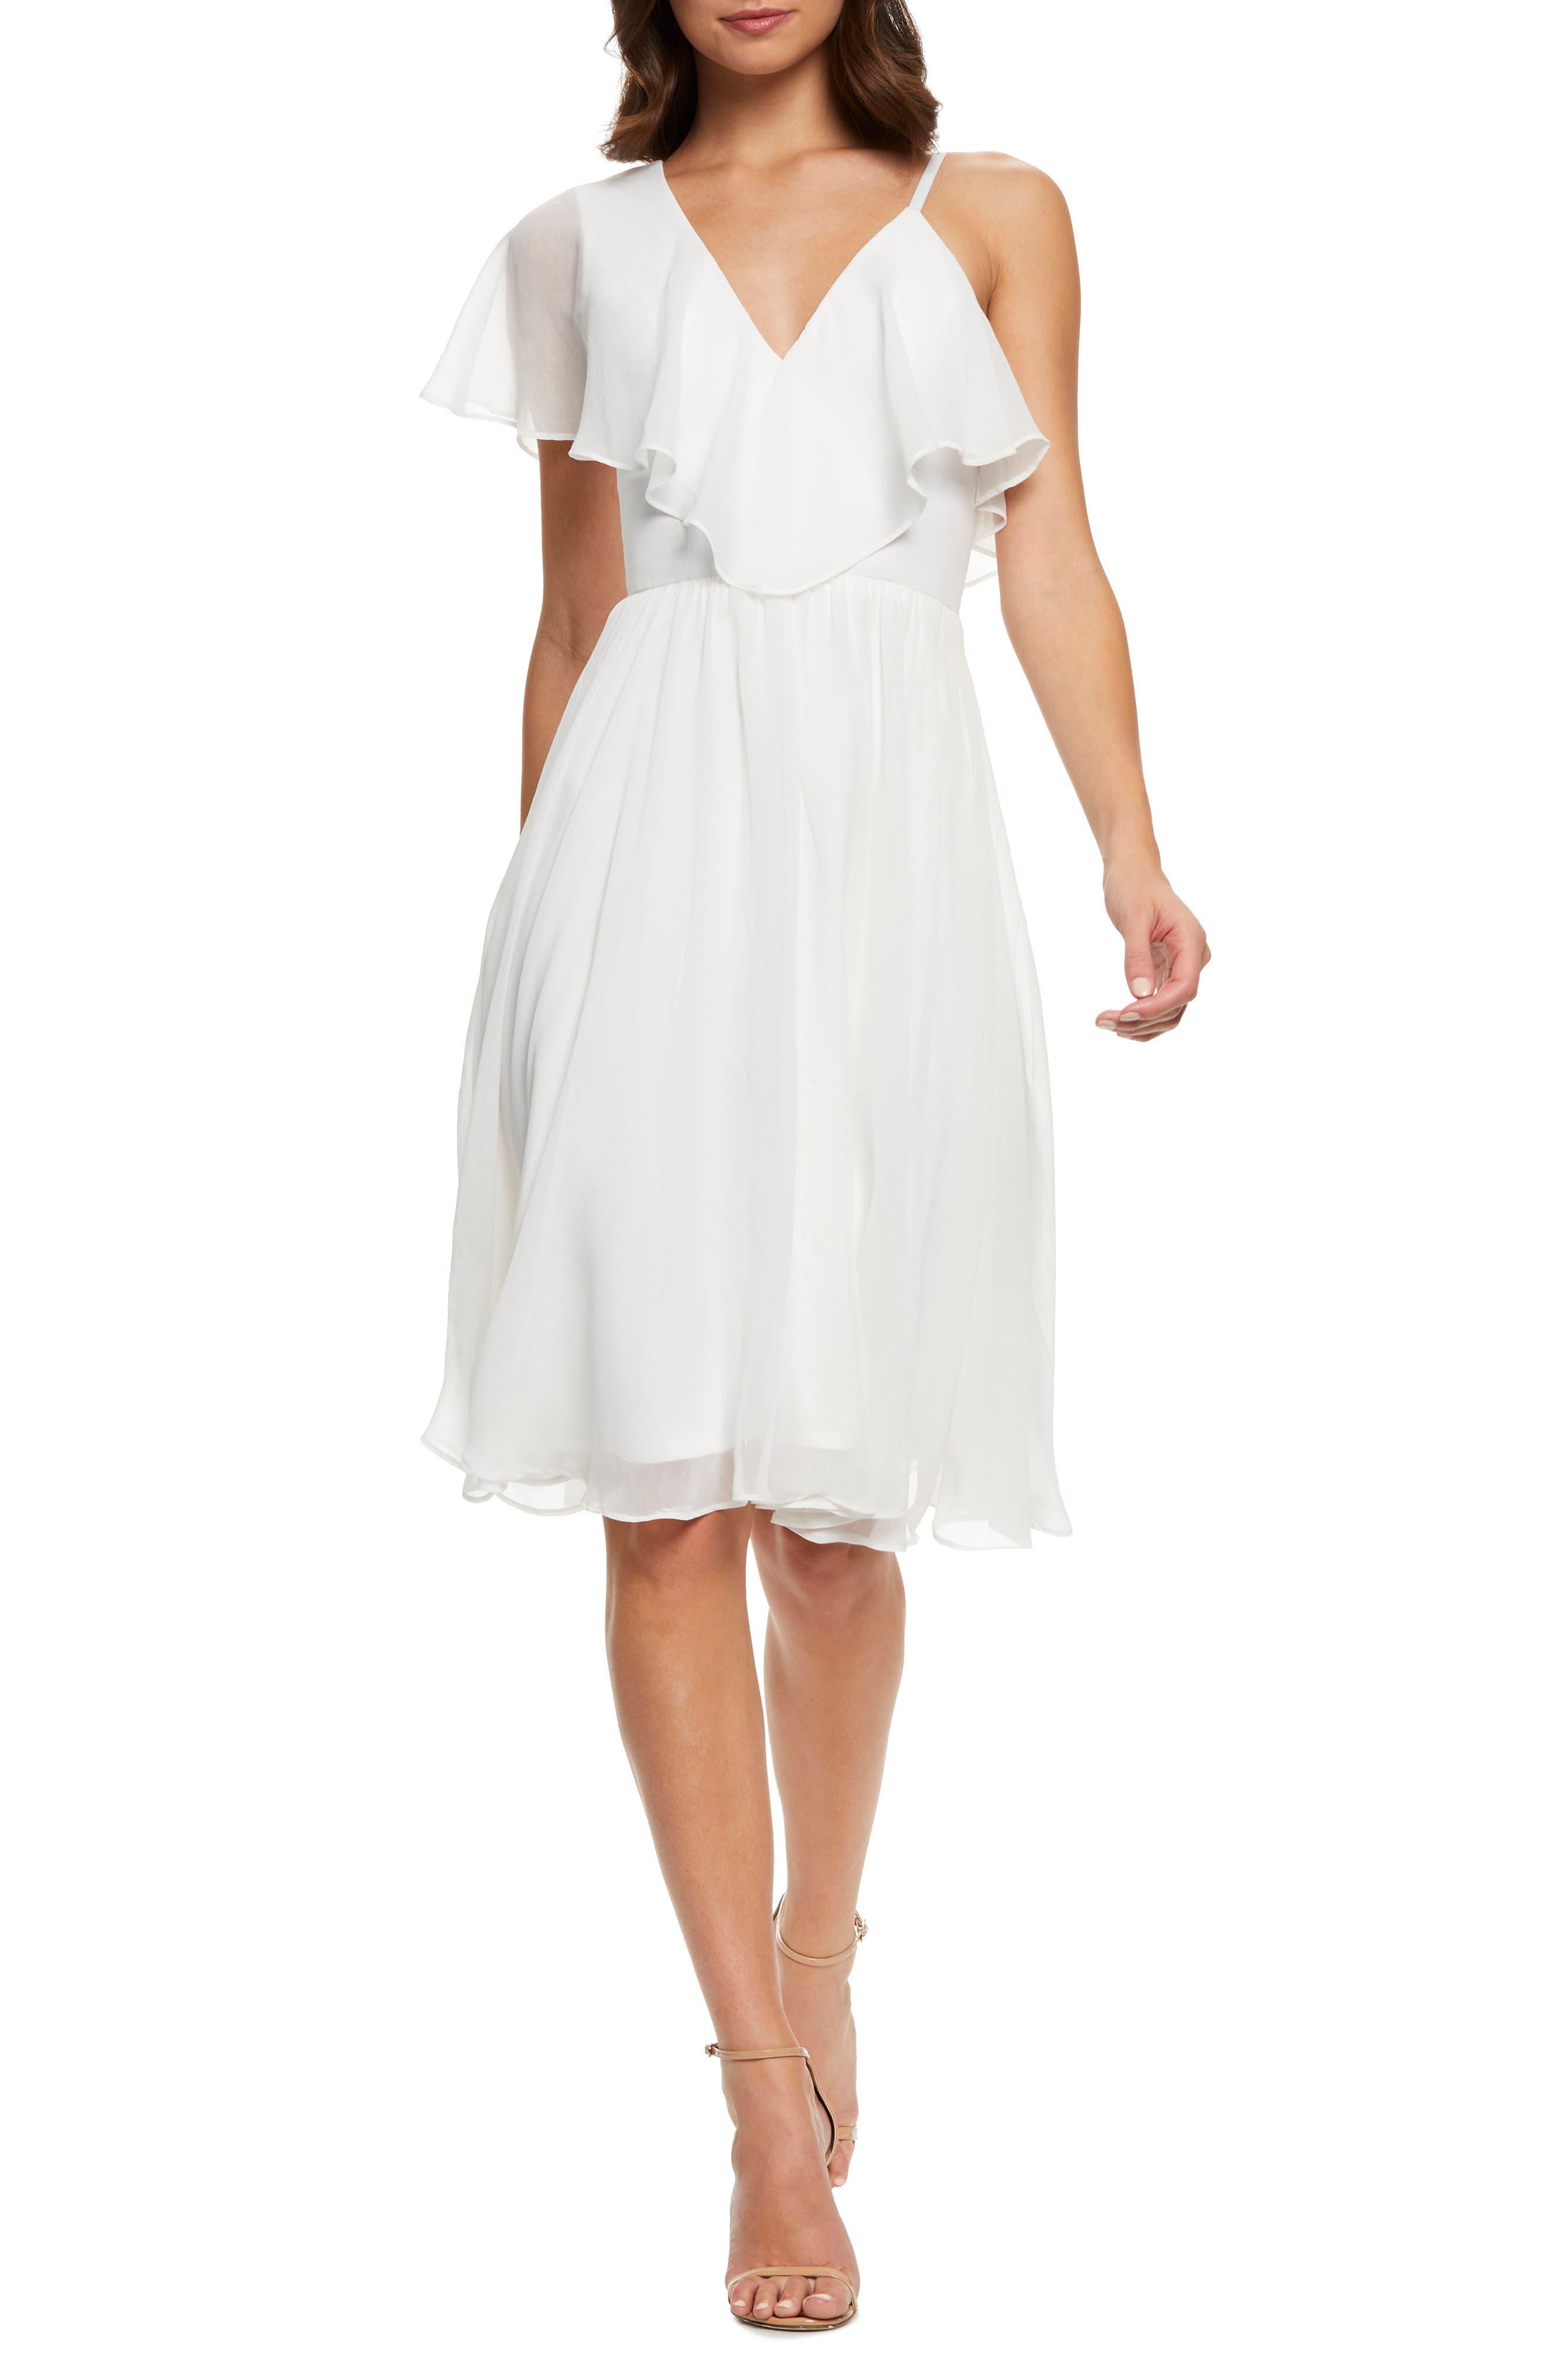 60s Wedding Dresses | 70s Wedding Dresses Womens Dress The Population Claudia Asymmetrical Ruffle Cocktail Dress Size XX-Small - White $198.00 AT vintagedancer.com